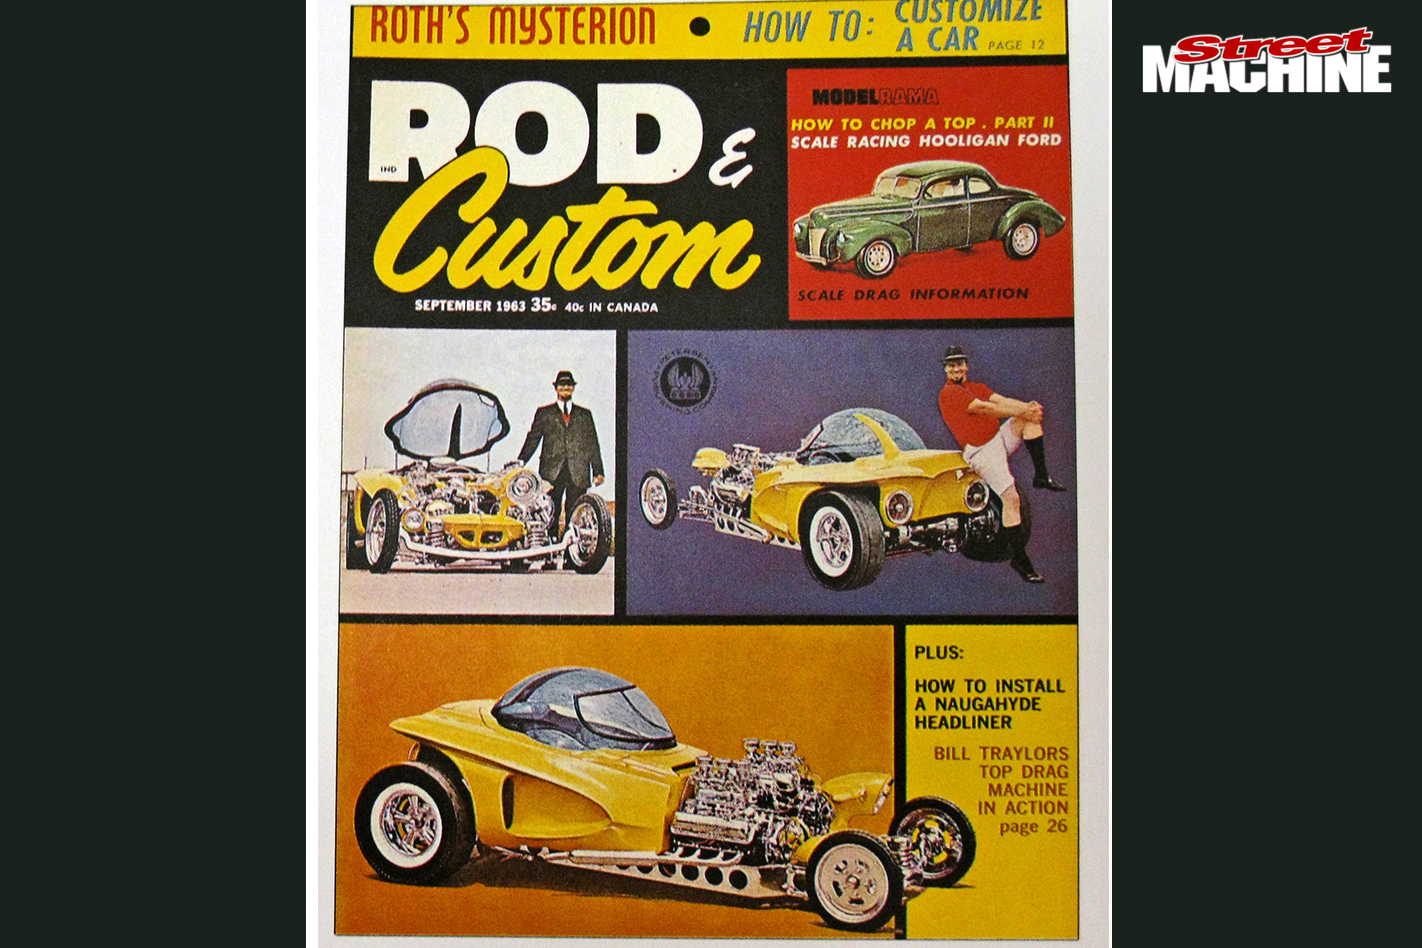 Rod -custom -magazine